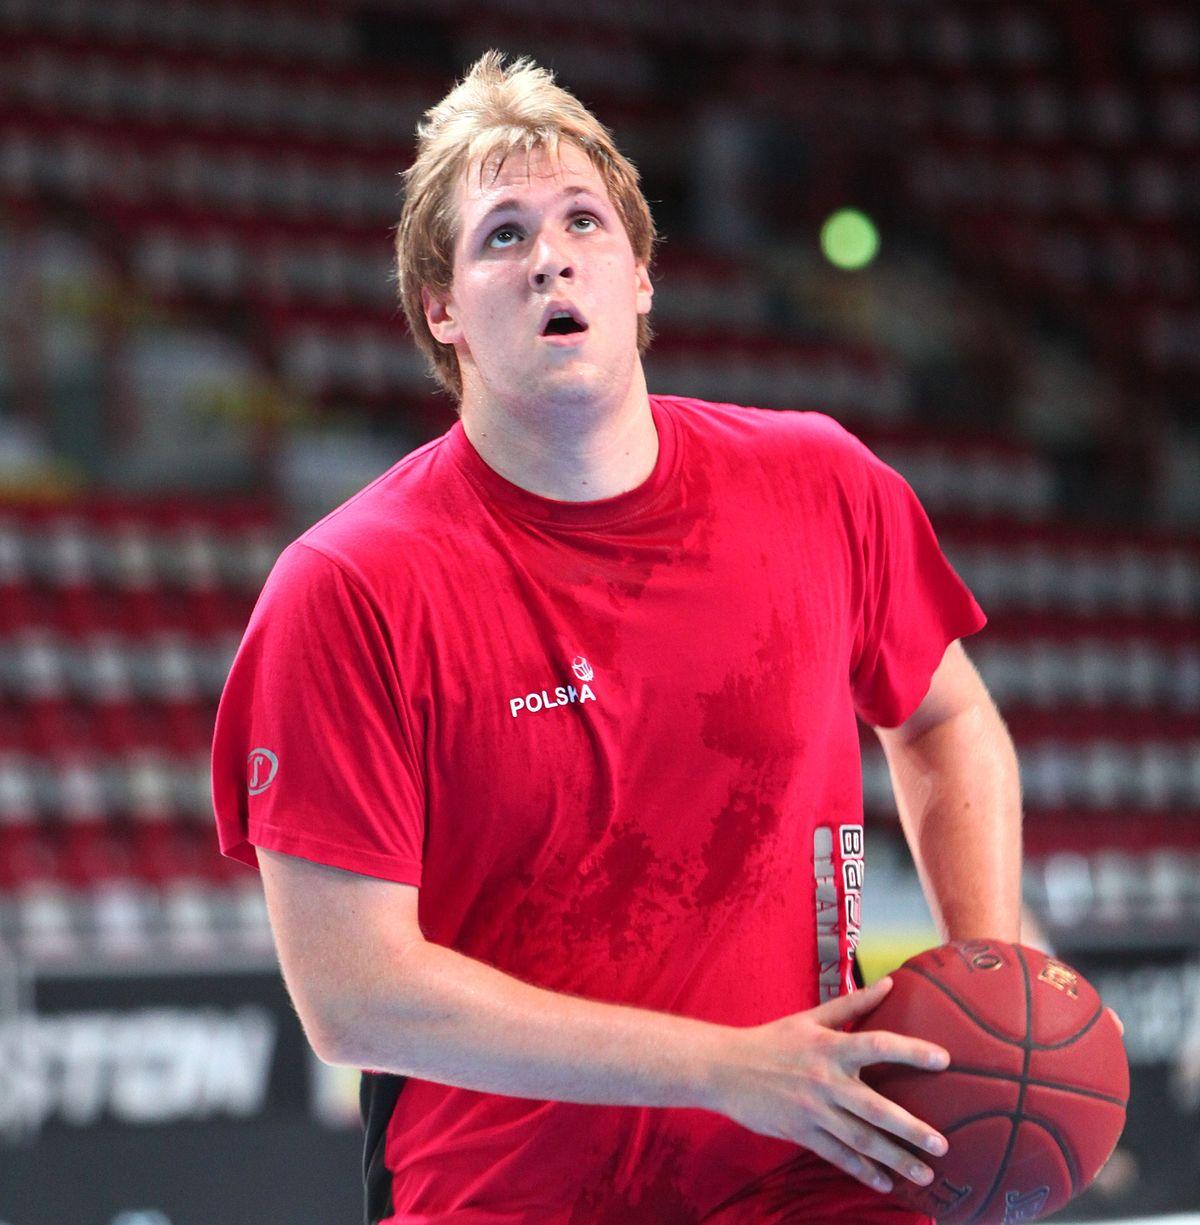 Gonzaga University Basketball >> Przemek Karnowski - Wikipedia